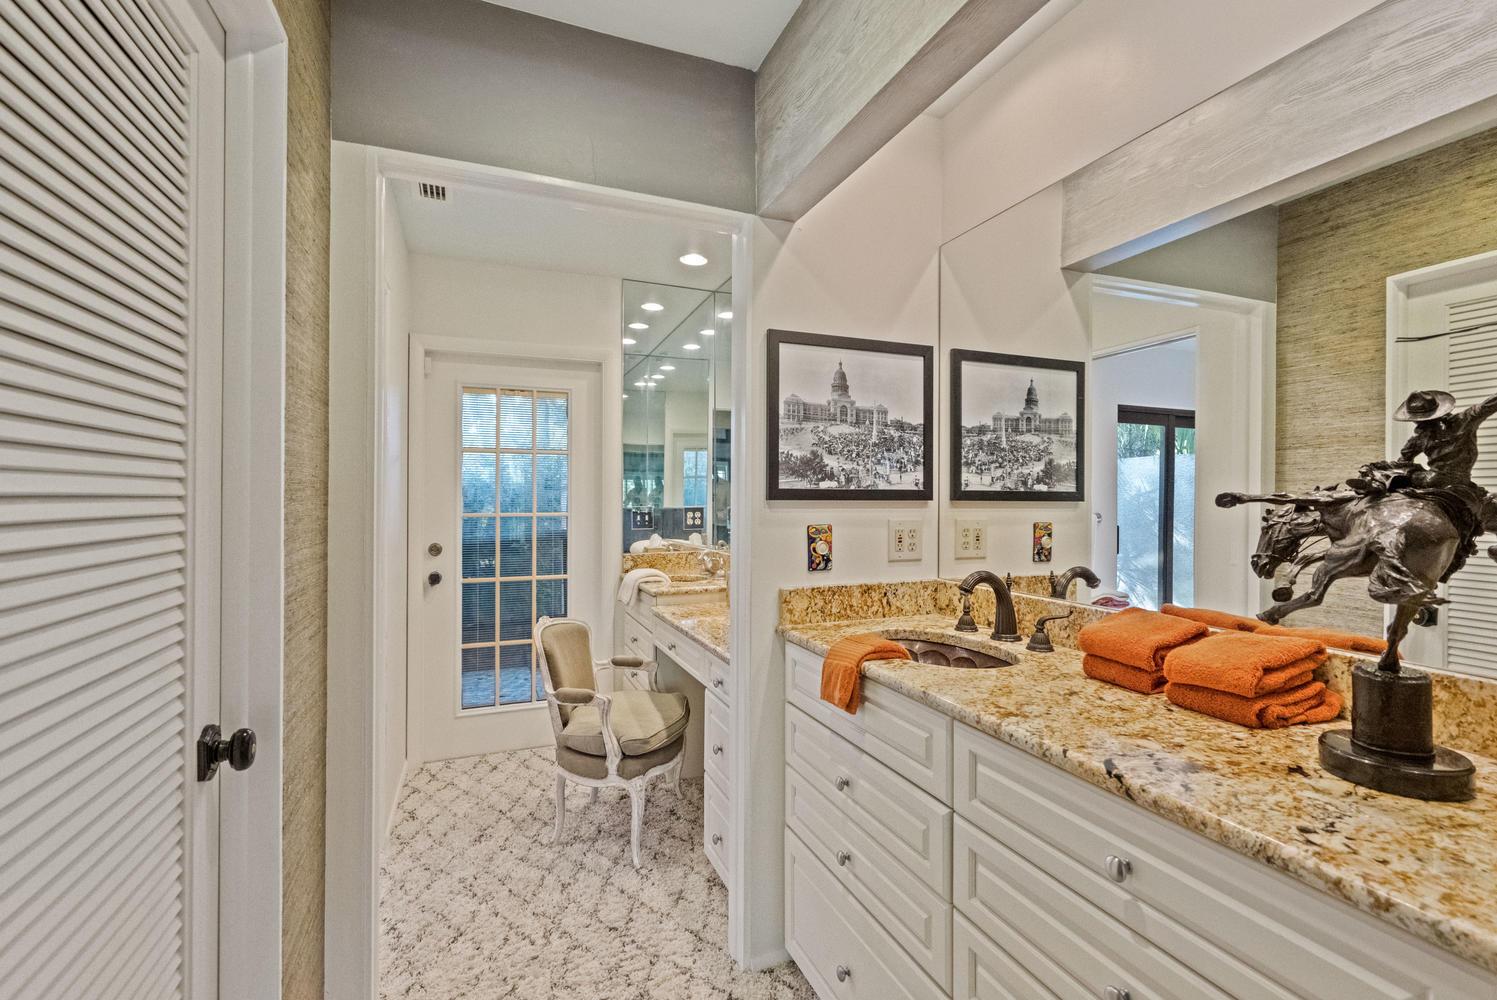 11835 Rene La Coste Place, Wellington, Florida 33414, 2 Bedrooms Bedrooms, ,2 BathroomsBathrooms,Villa,For Sale,Palm Beach Polo,Rene La Coste,RX-10590041